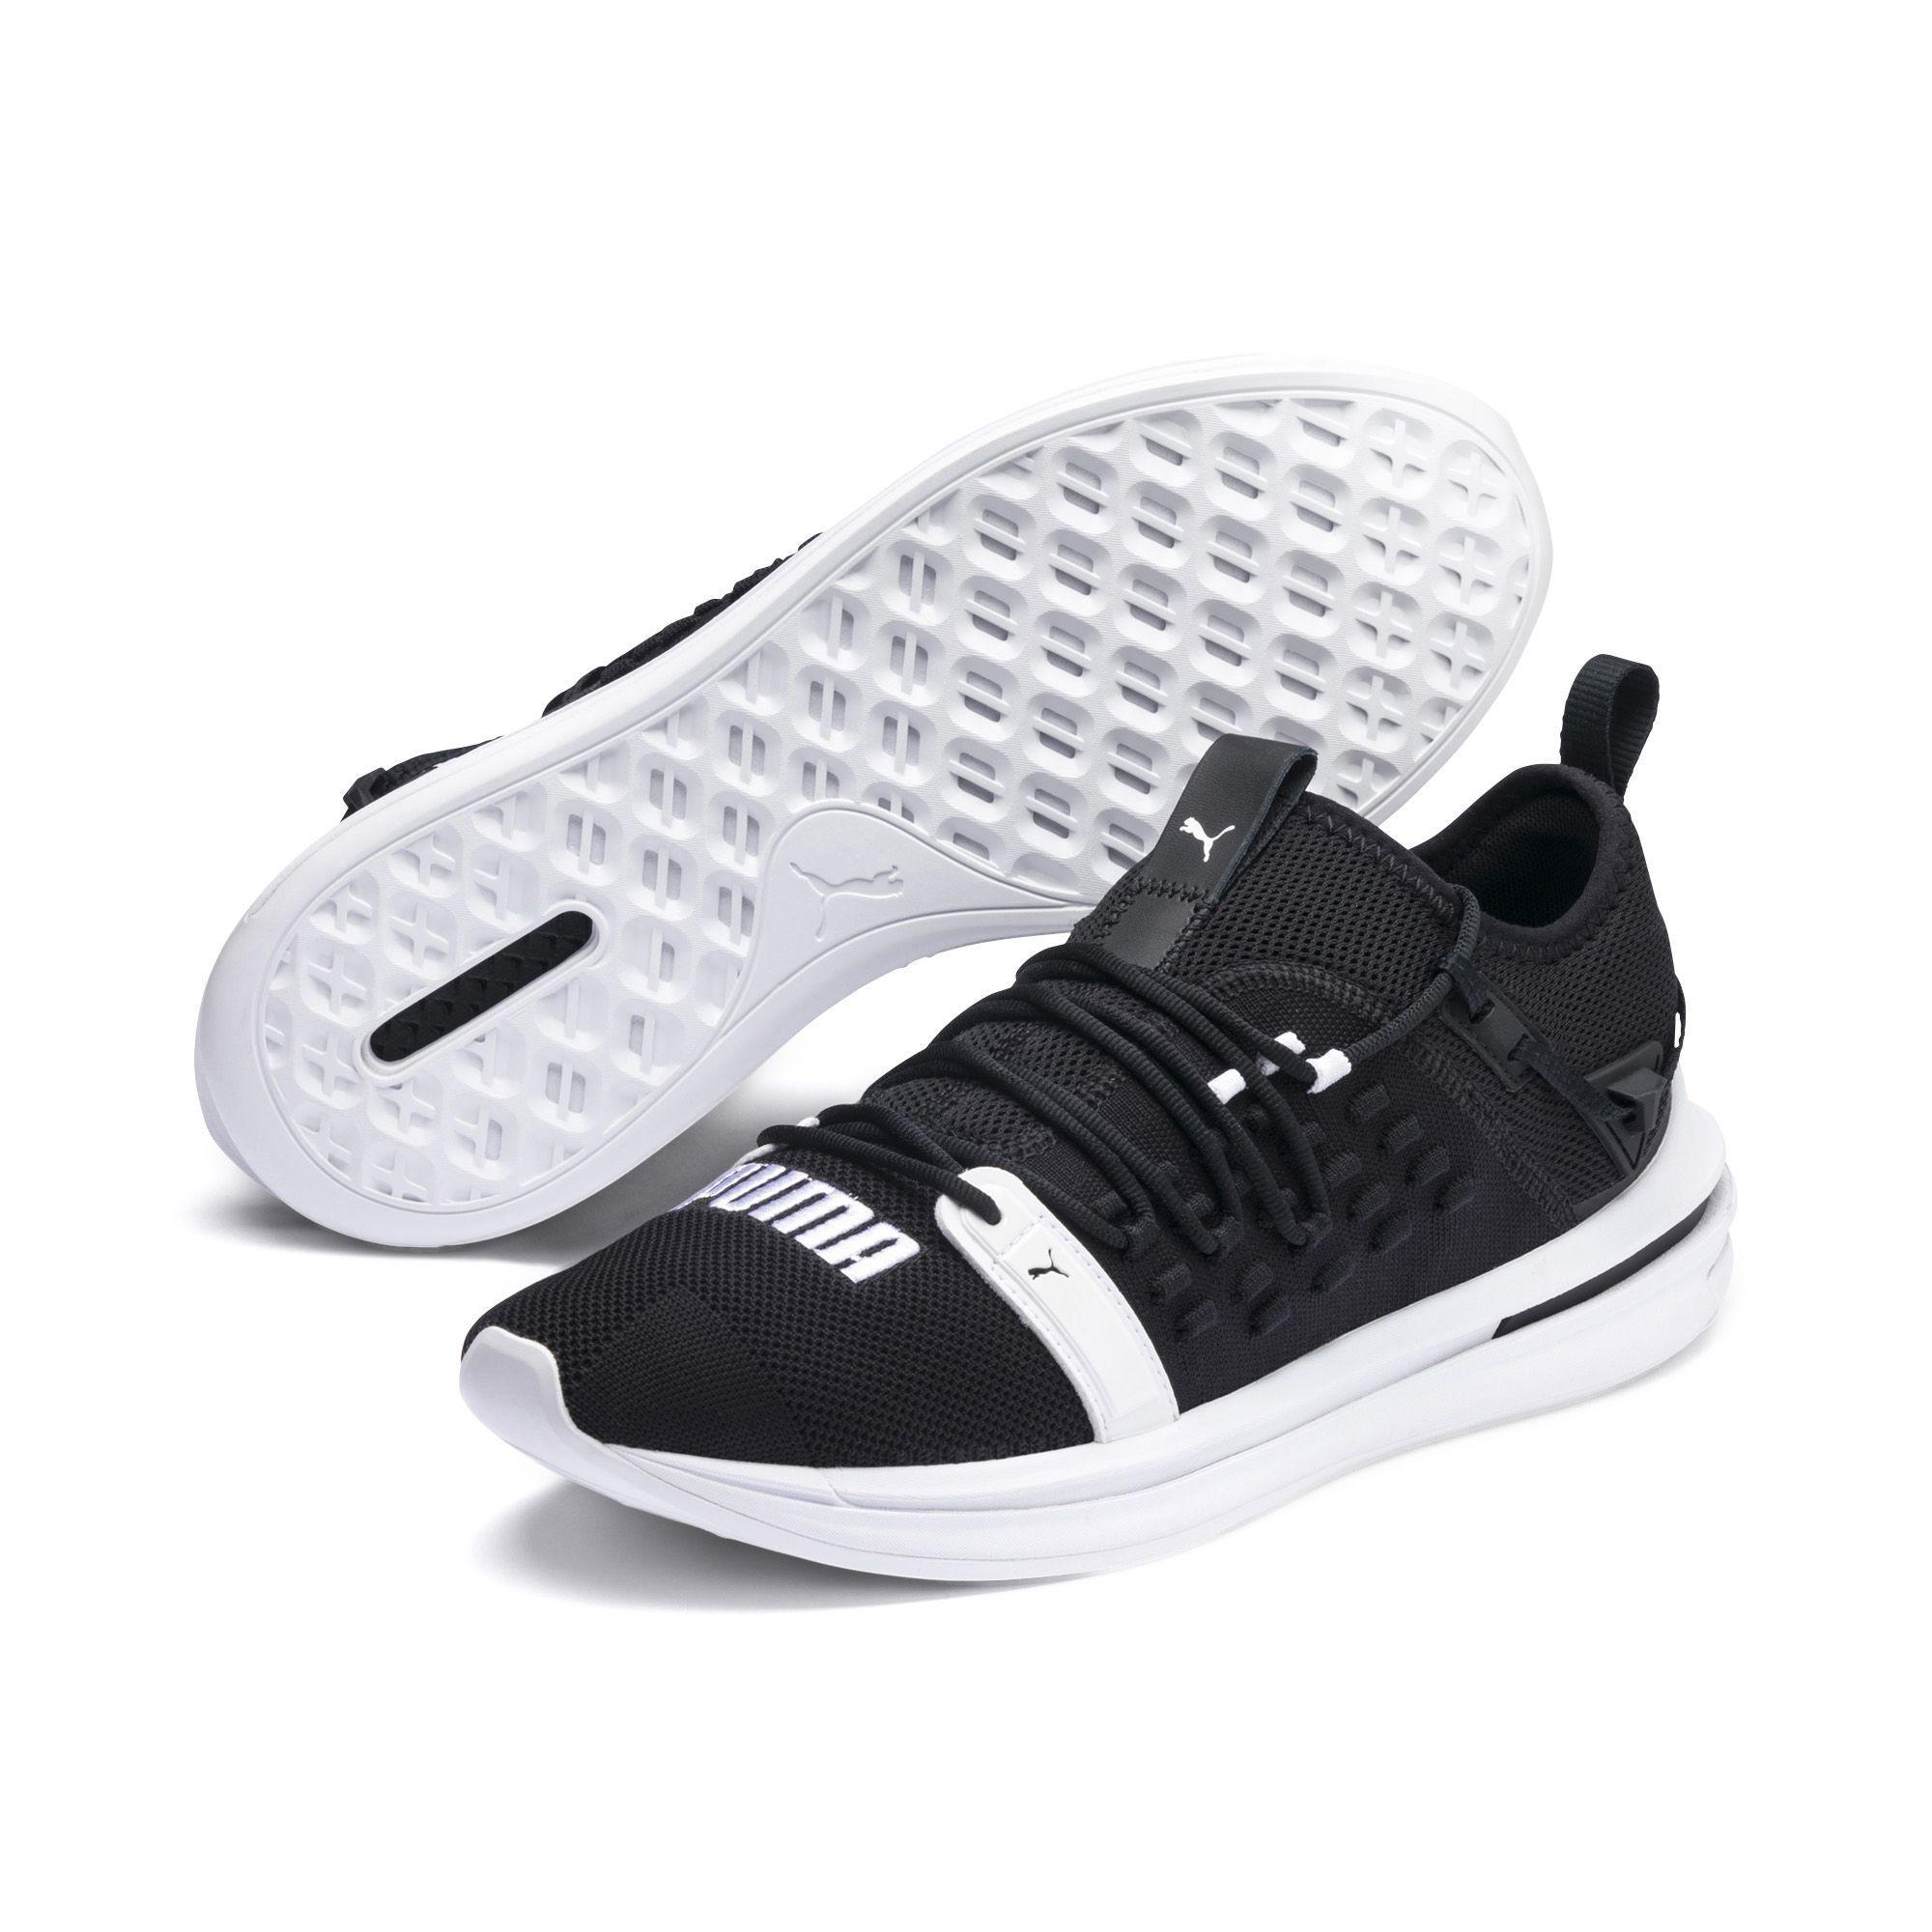 PUMA - Black Ignite Limitless Sr Fusefit Running Shoes for Men - Lyst. View  fullscreen d3cdce59b